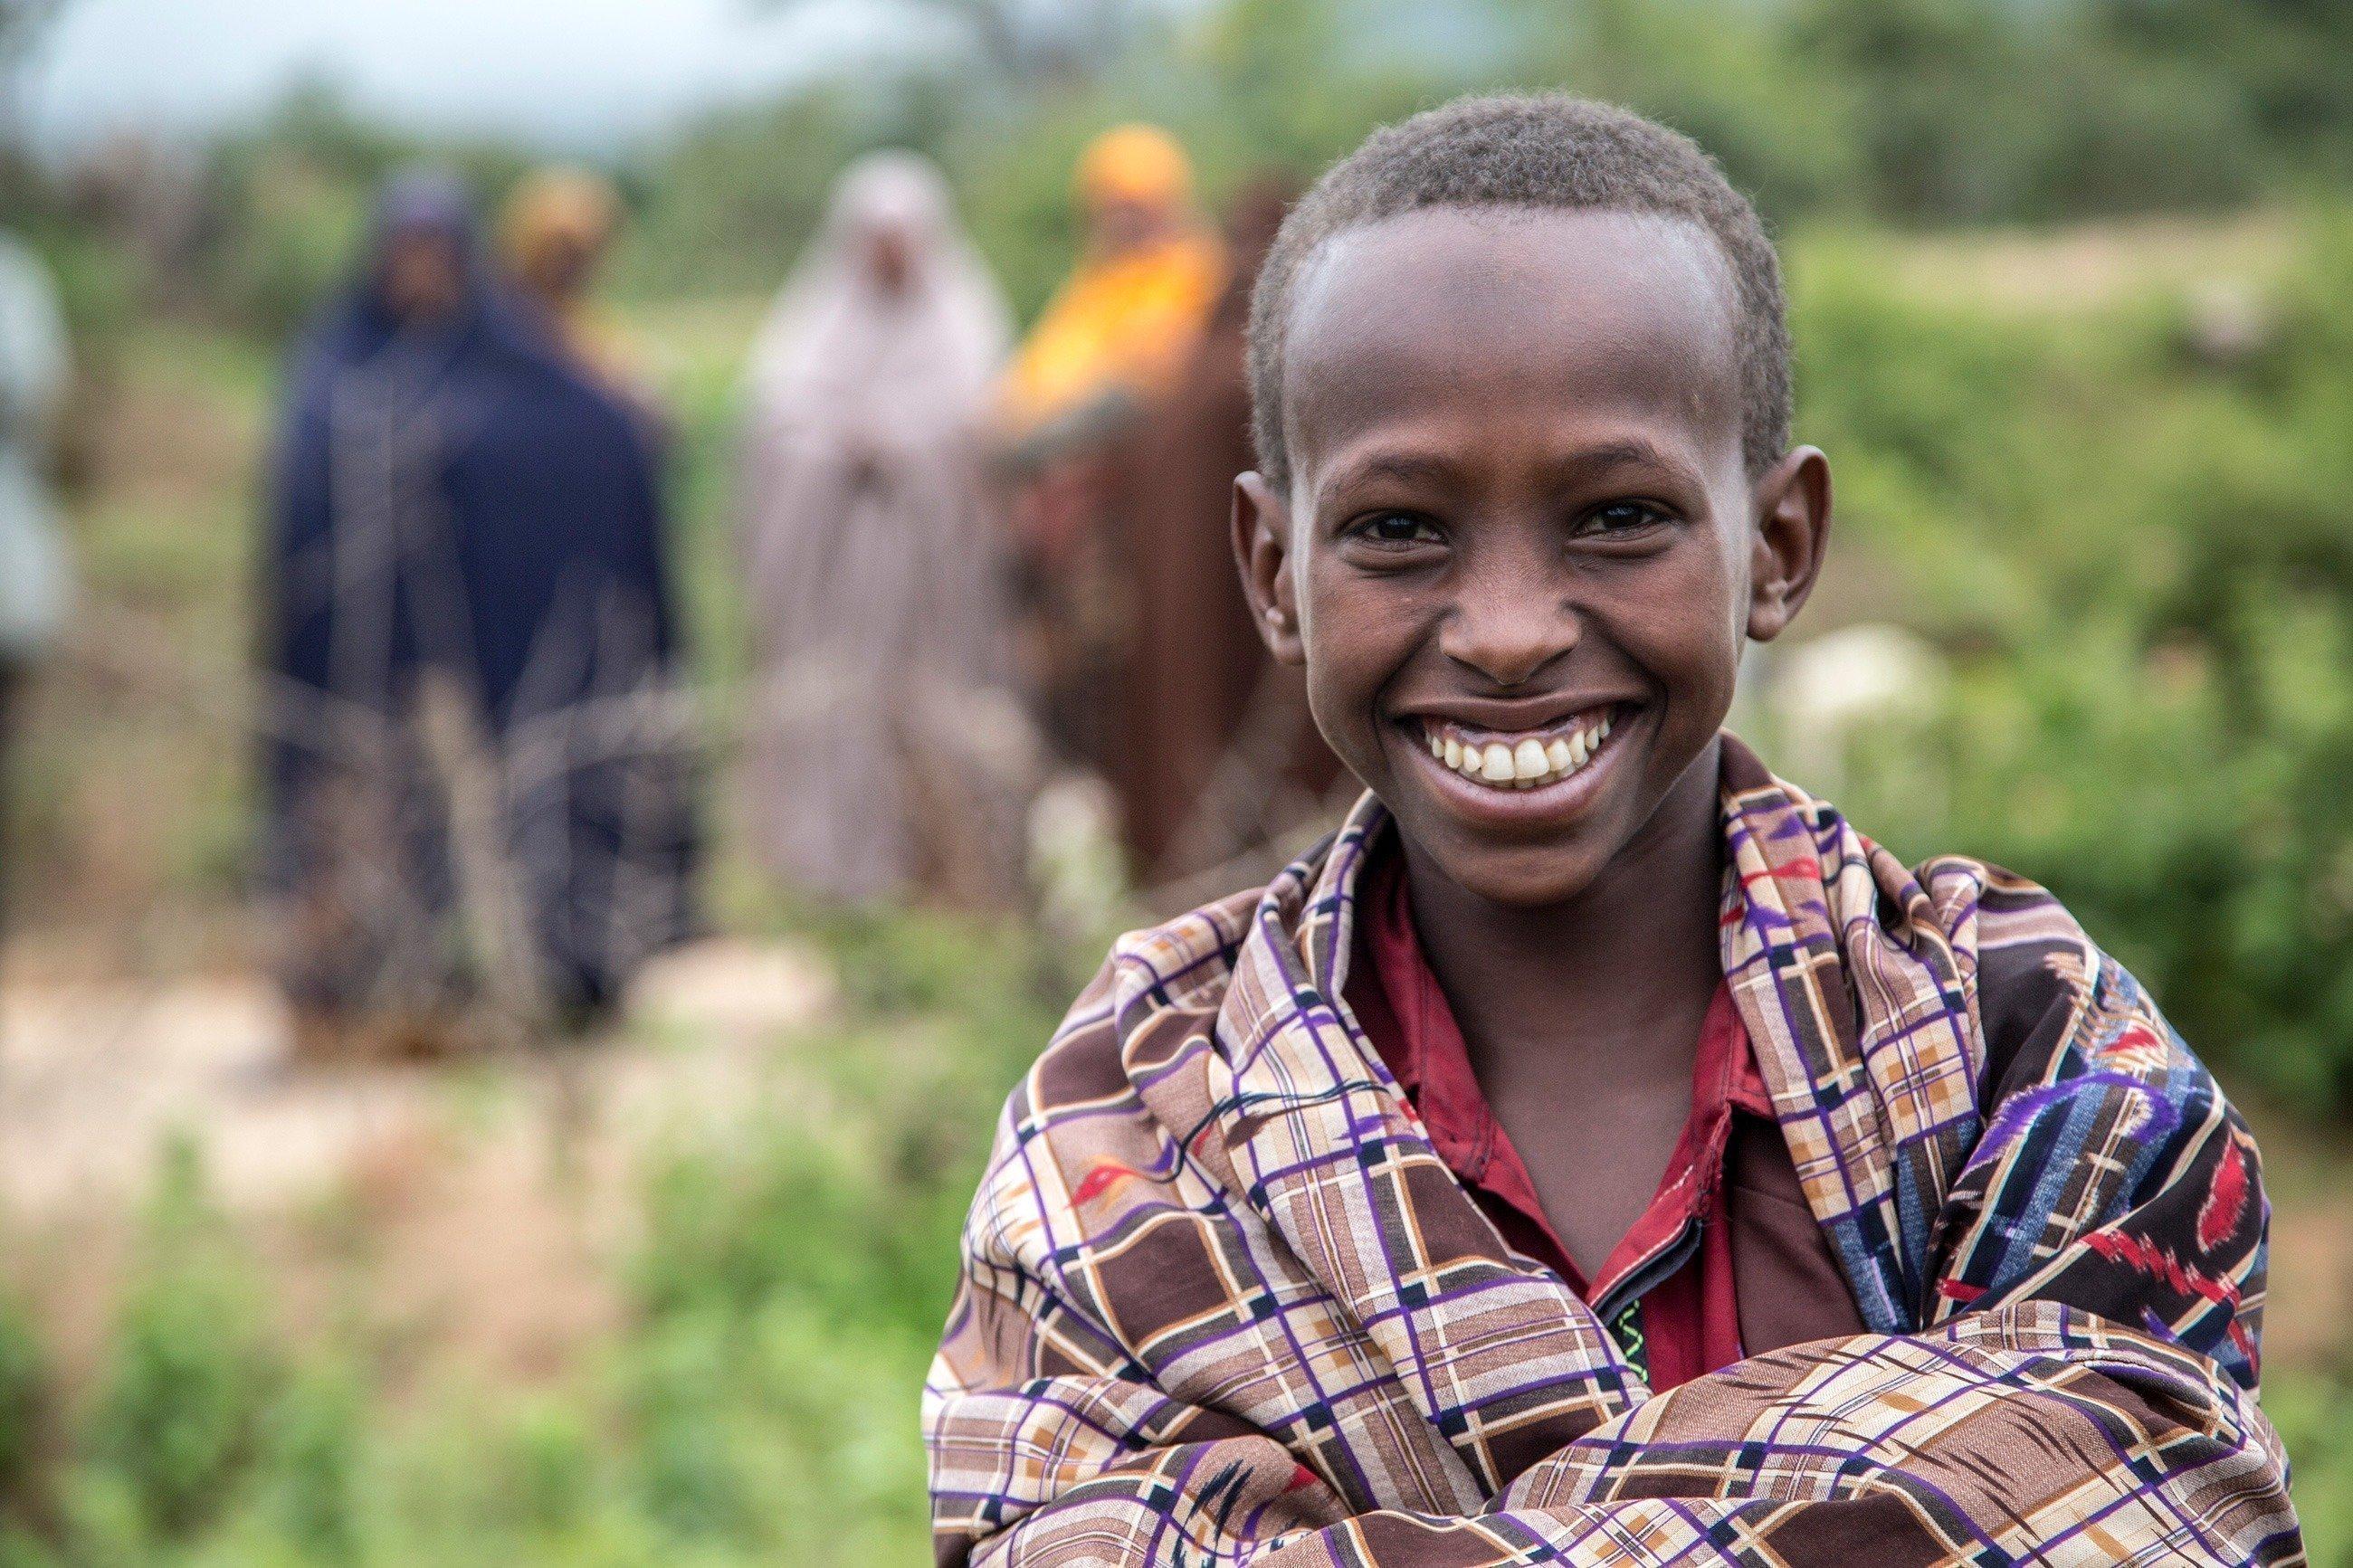 Bambino africano sorride alla fotocamera.